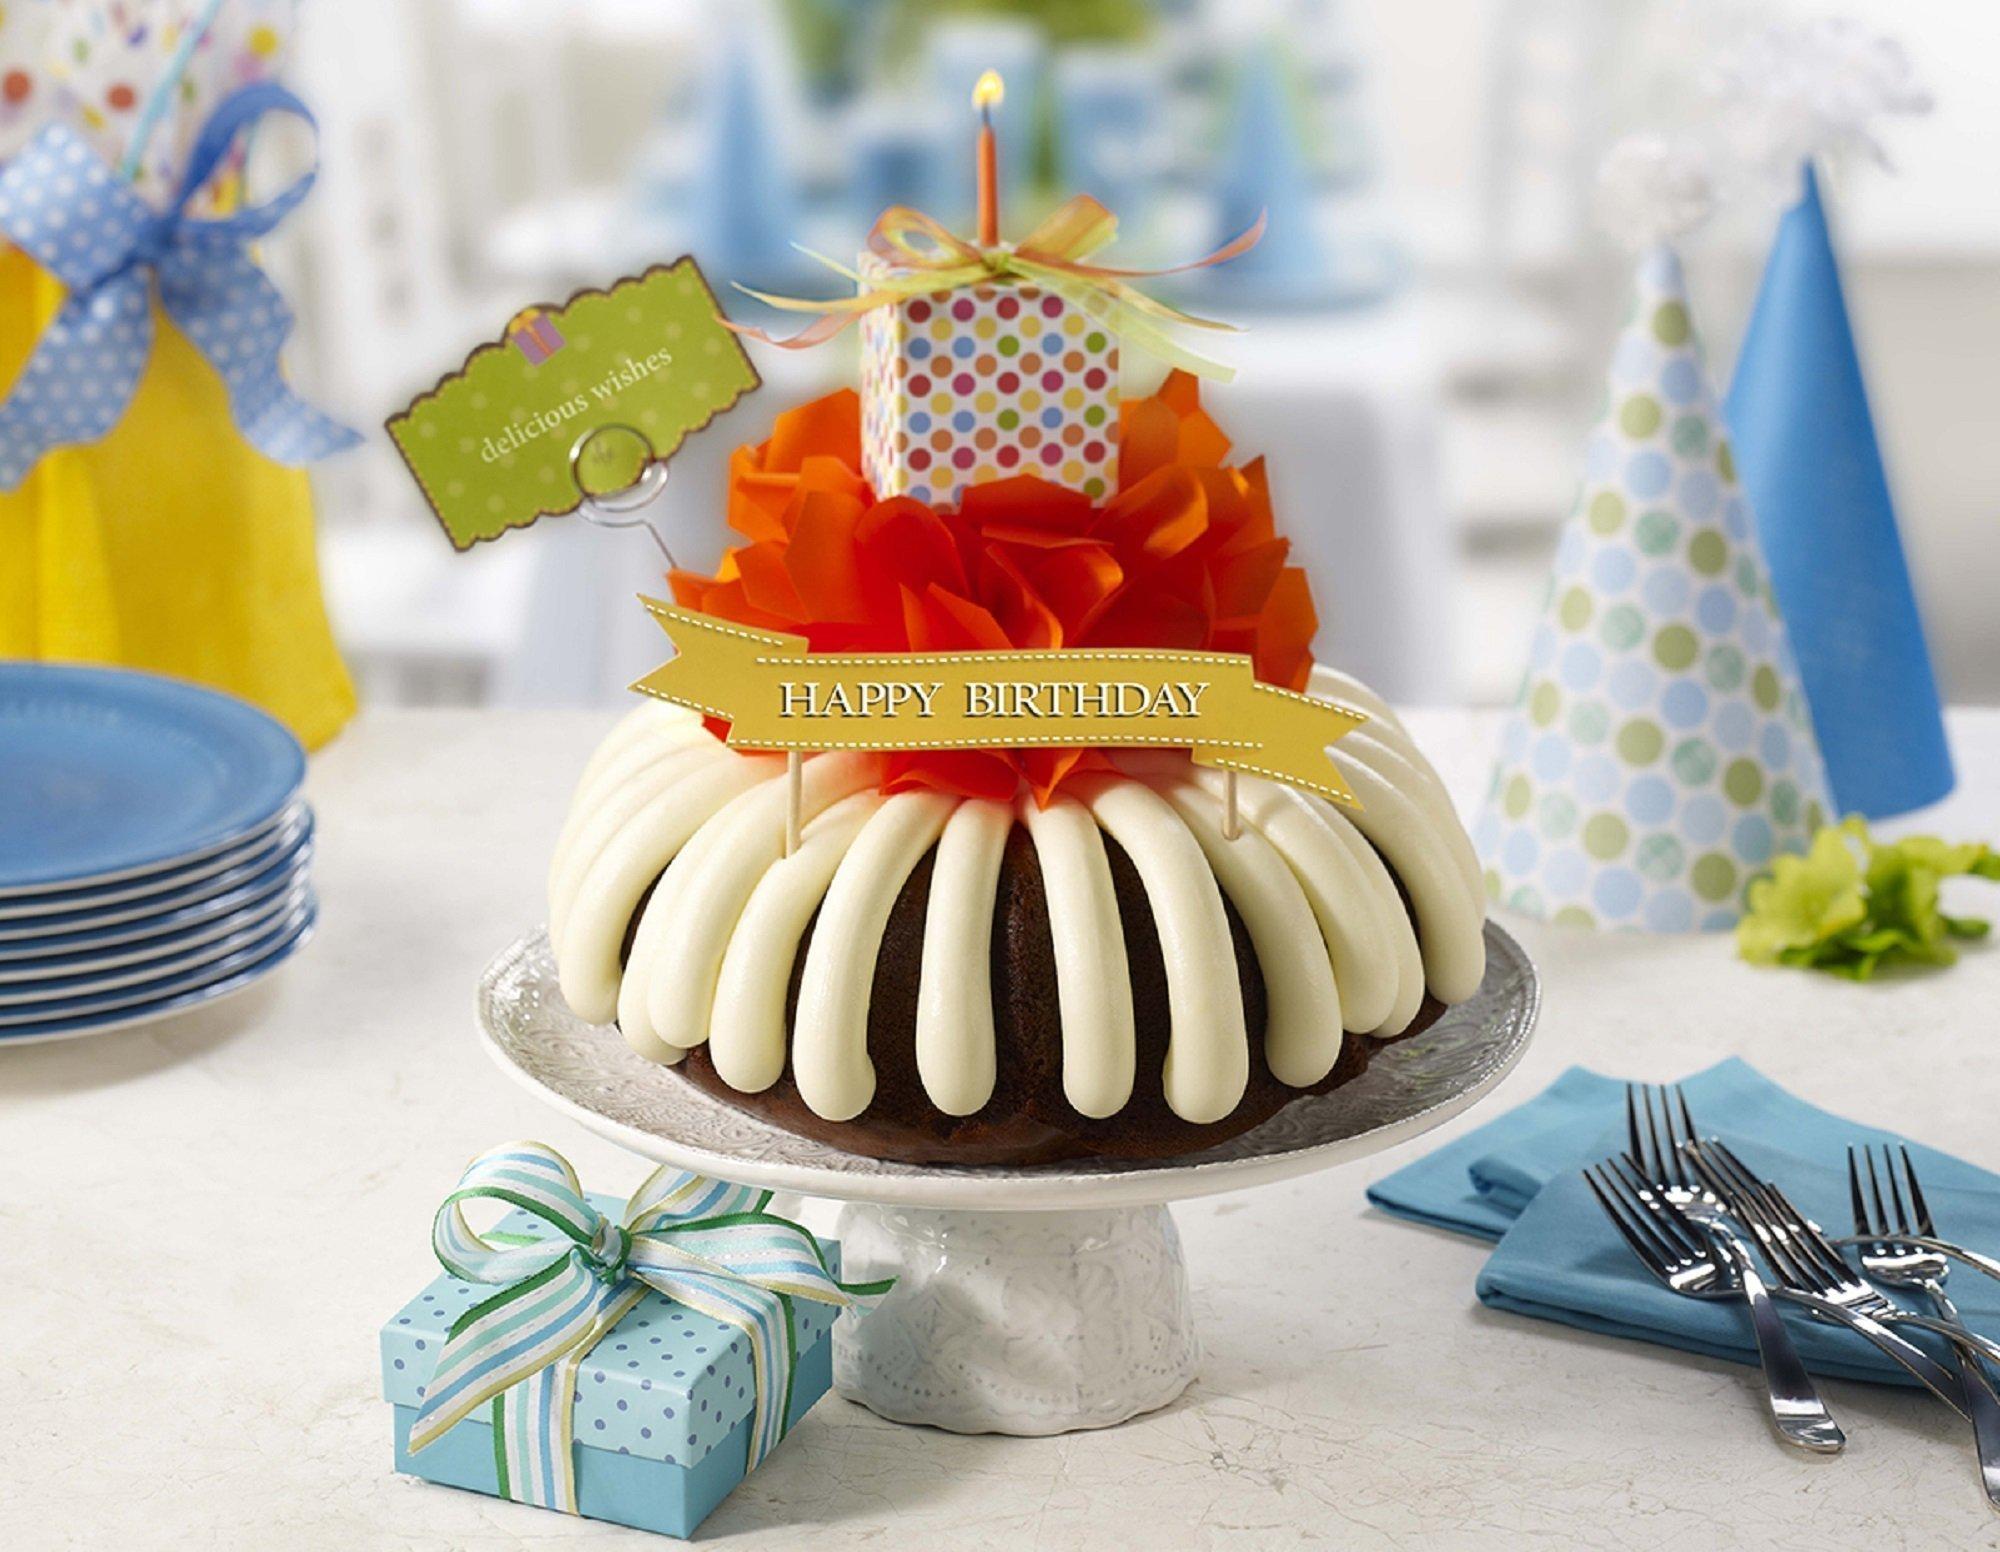 Sweet Success Nothing Bundt Cakes Franchiser Opening